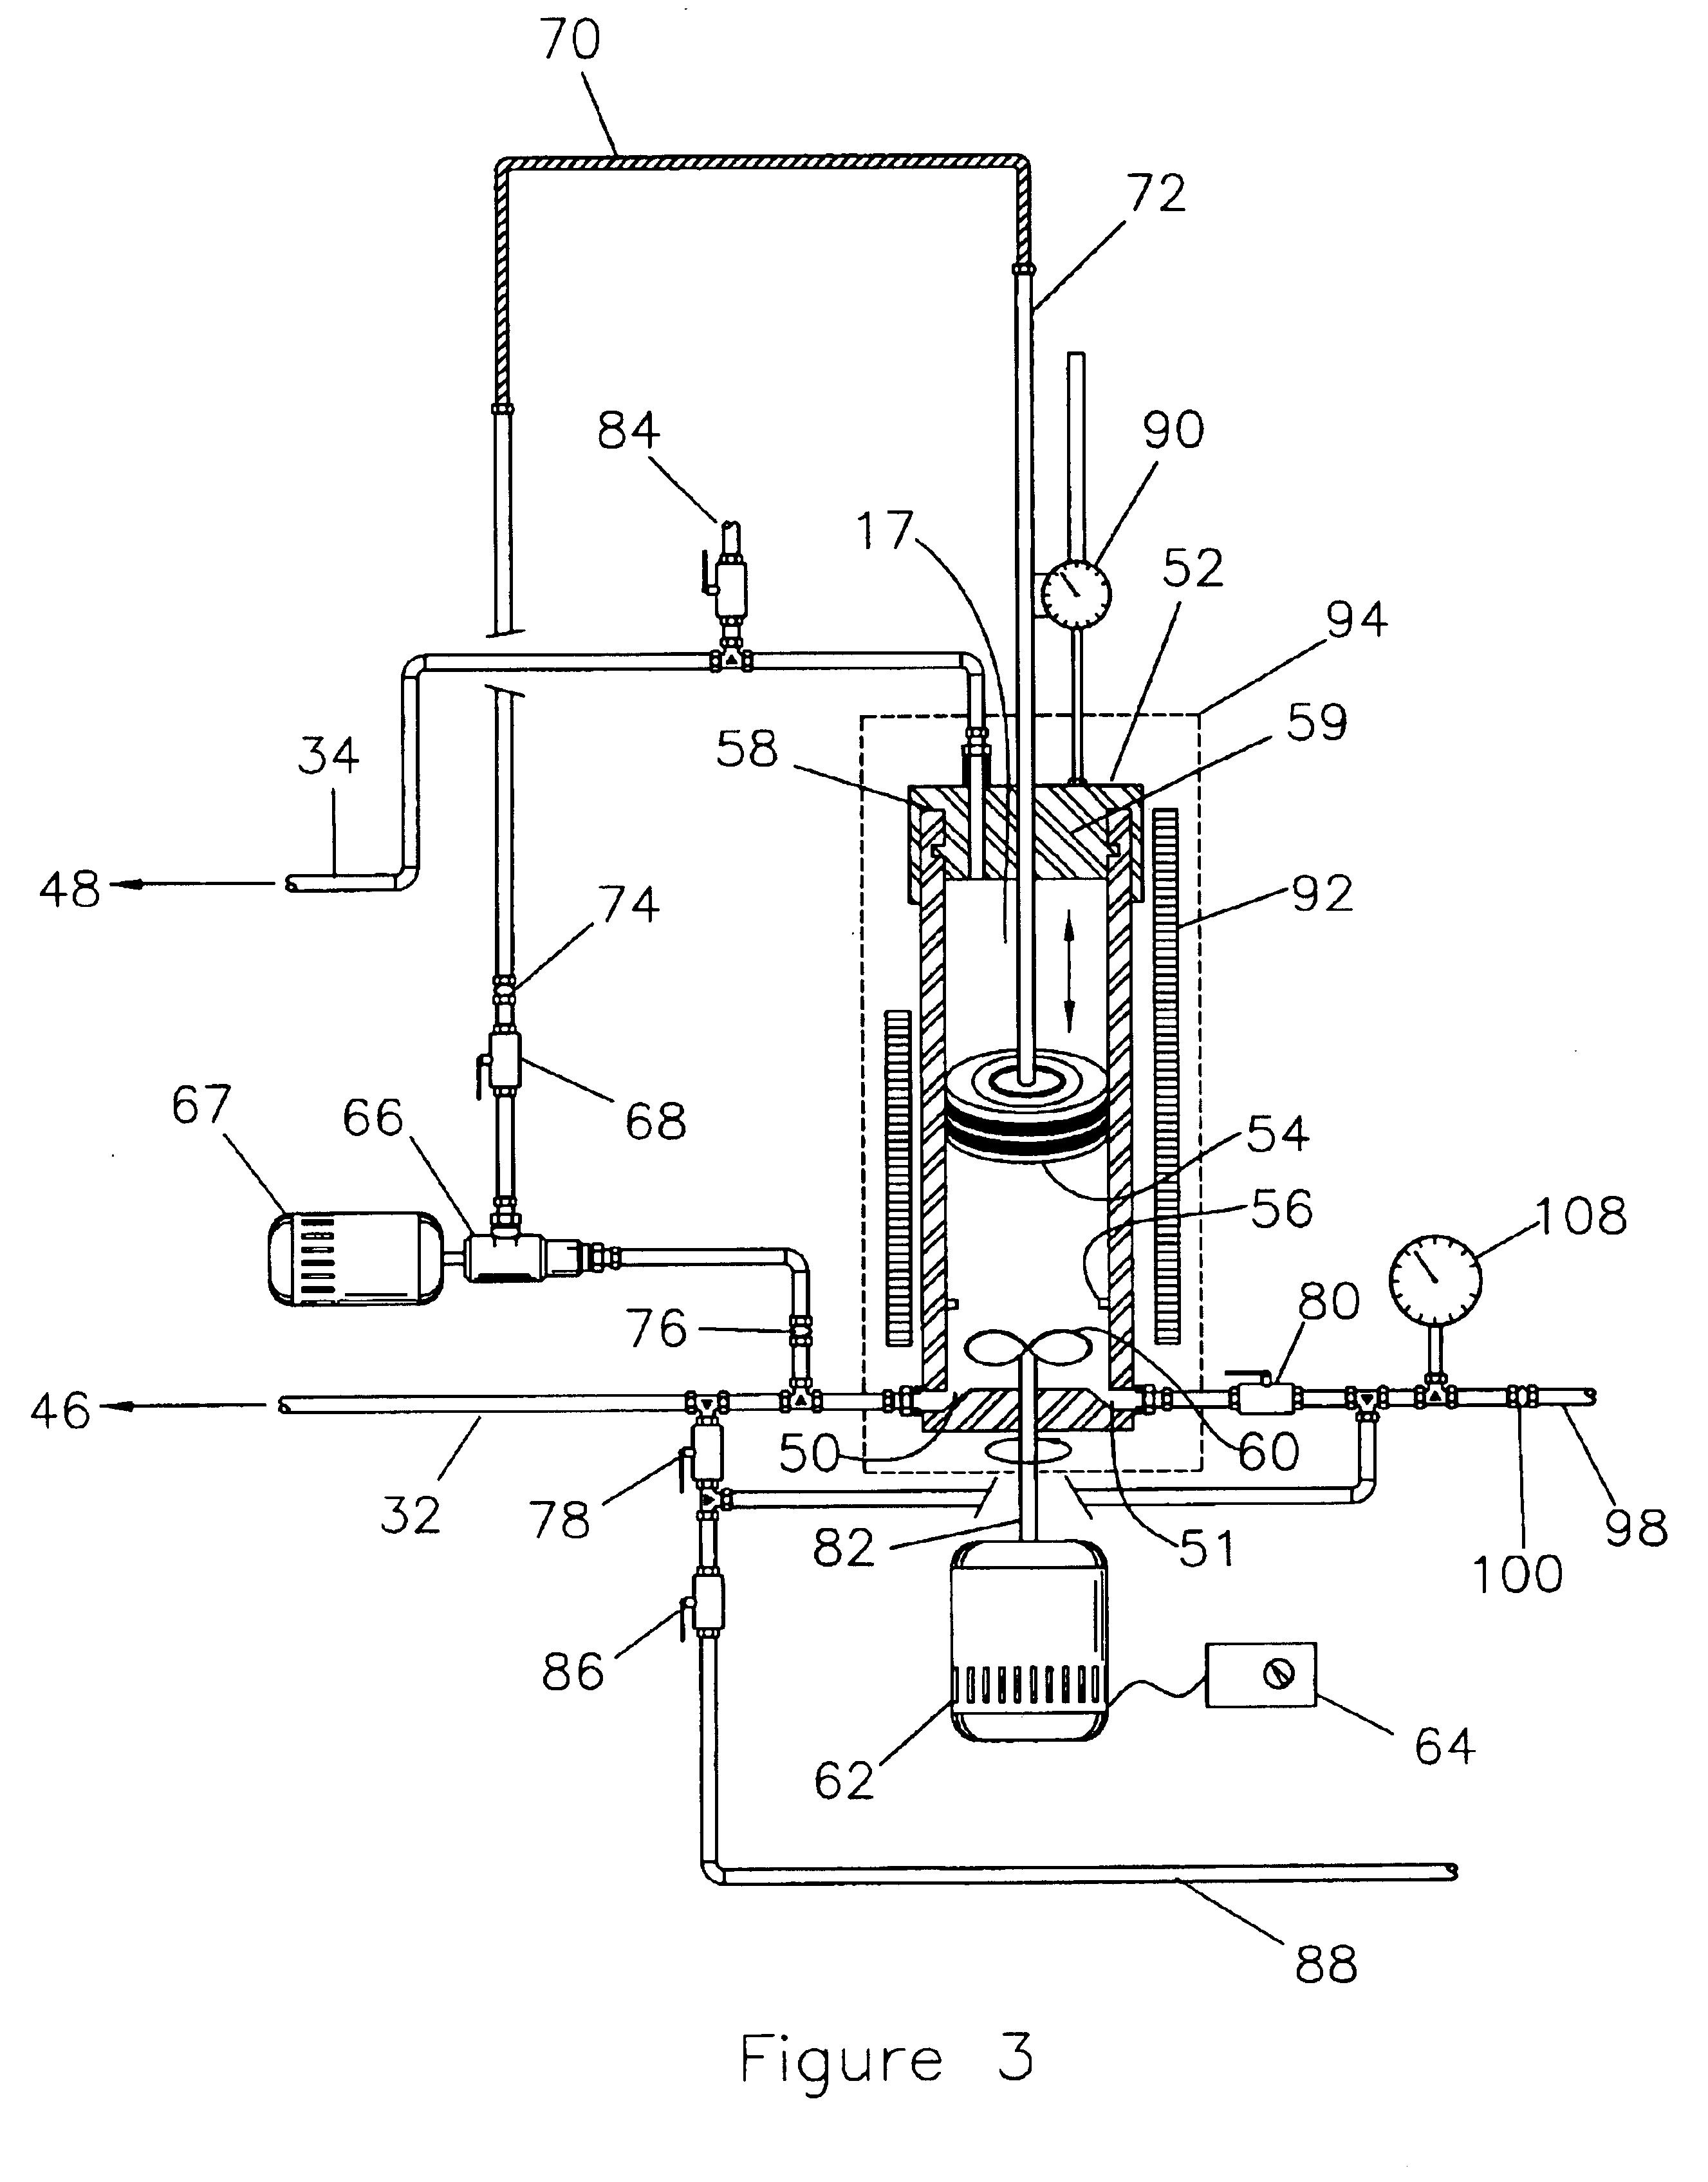 AST Oil Tank Standards UL furthermore Starter Generator Wiring Diagram moreover John Deere 6200 Parts Diagram furthermore US6807849 moreover Discussion C11488 ds546441. on generator gas tank